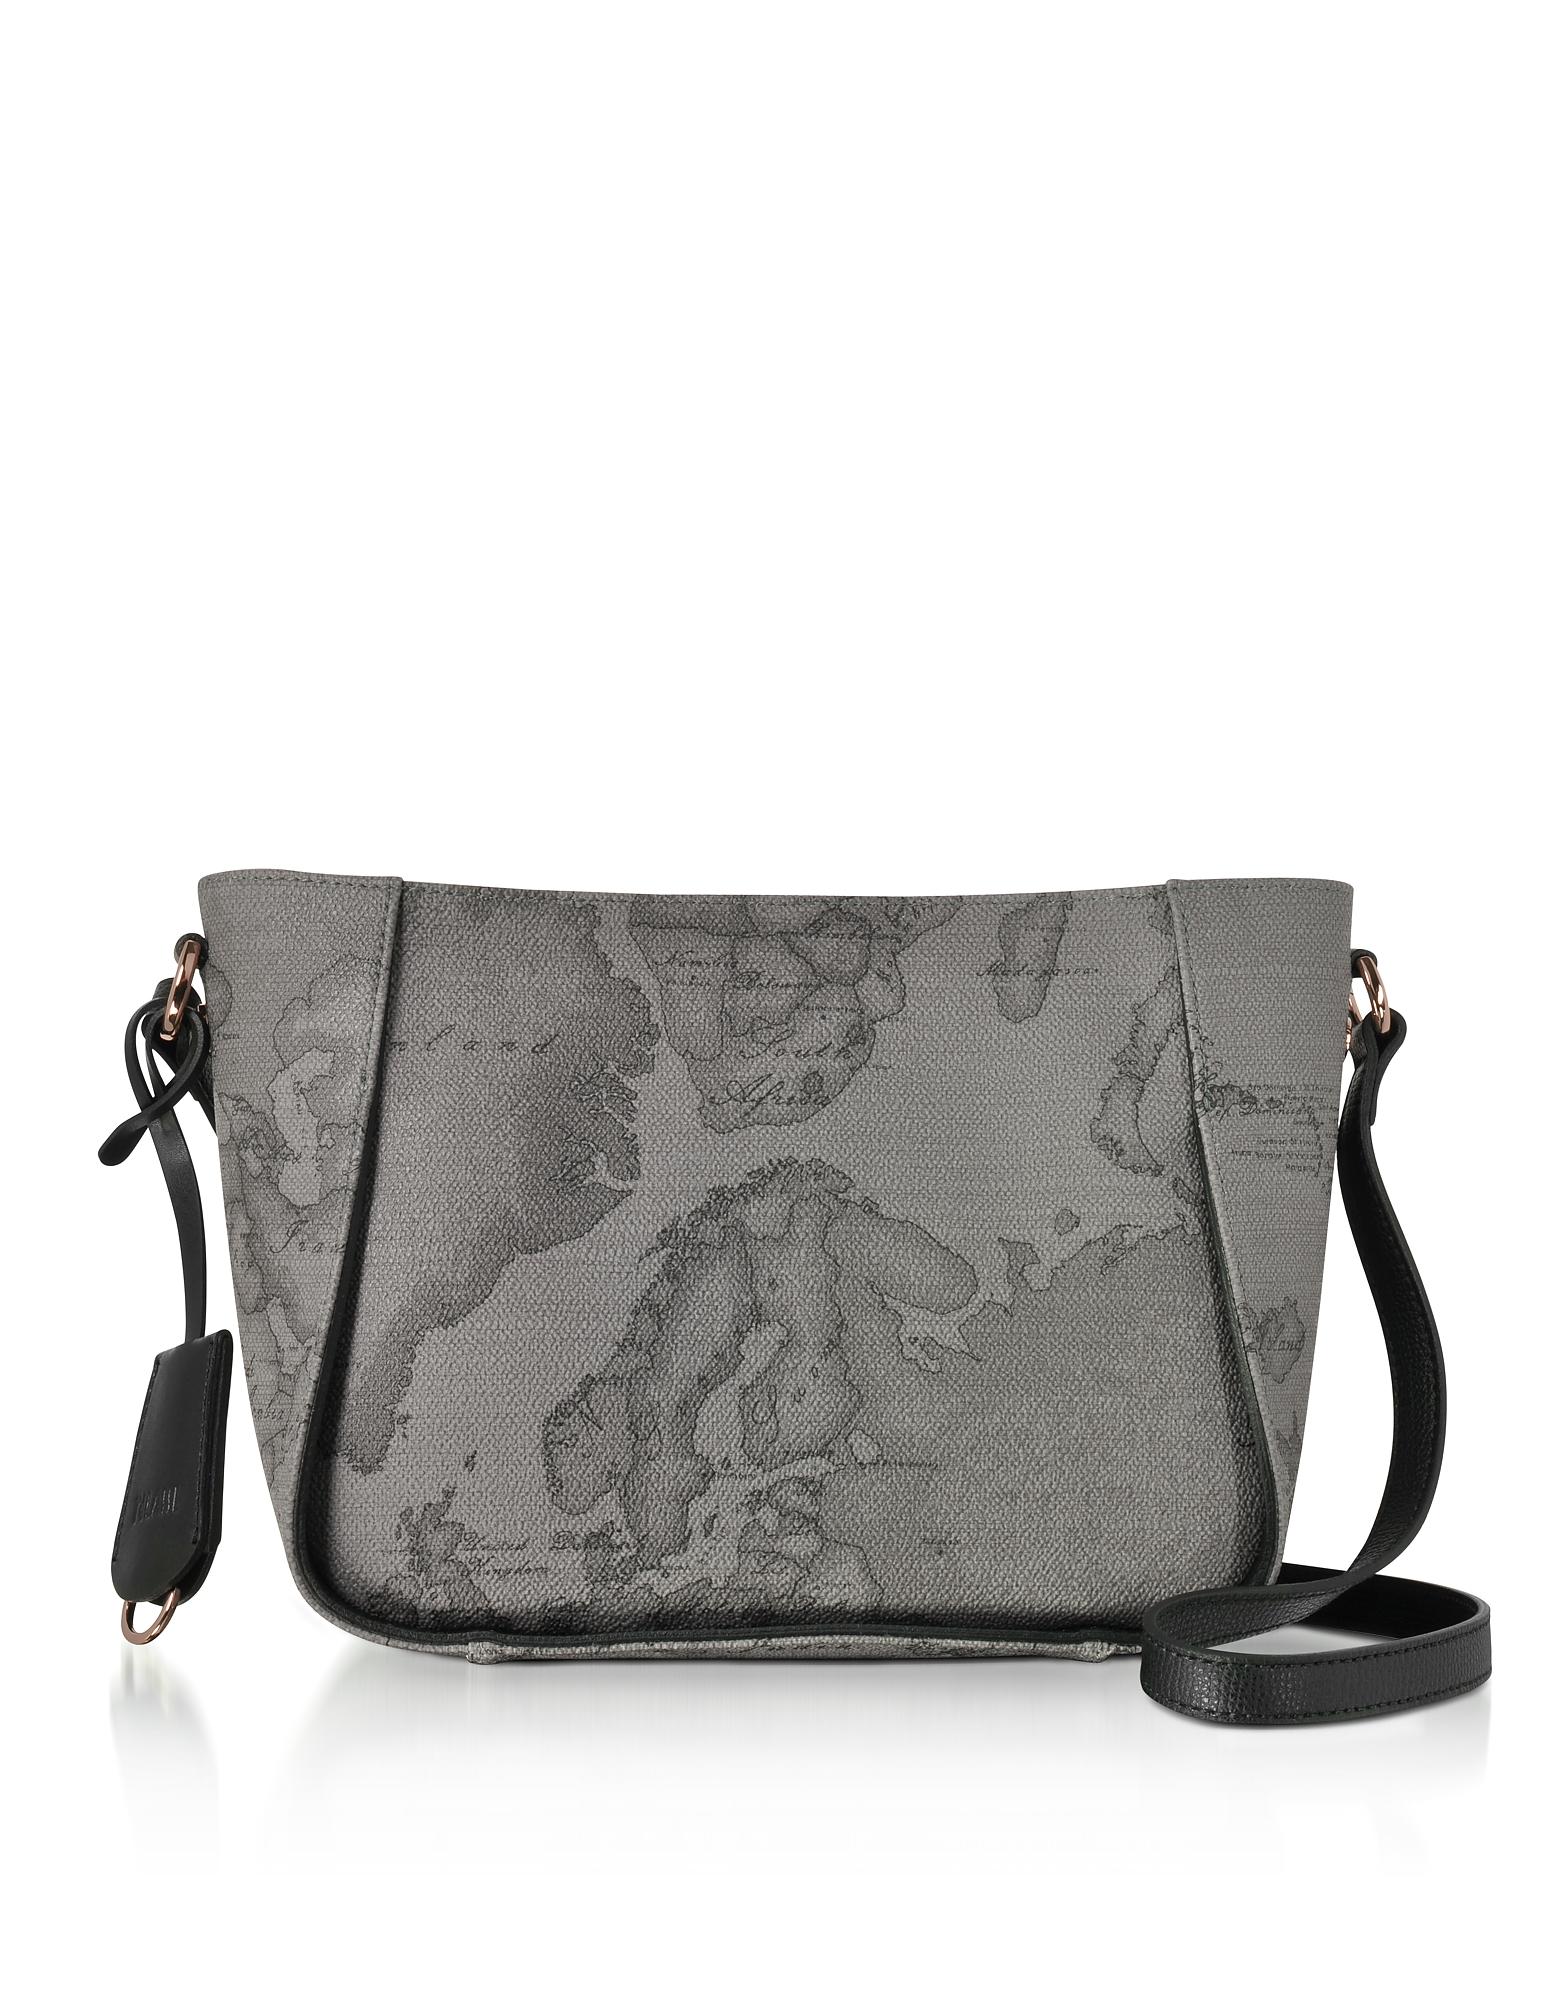 Alviero Martini 1A Classe Handbags, Dark Night Small Crossbody Bag